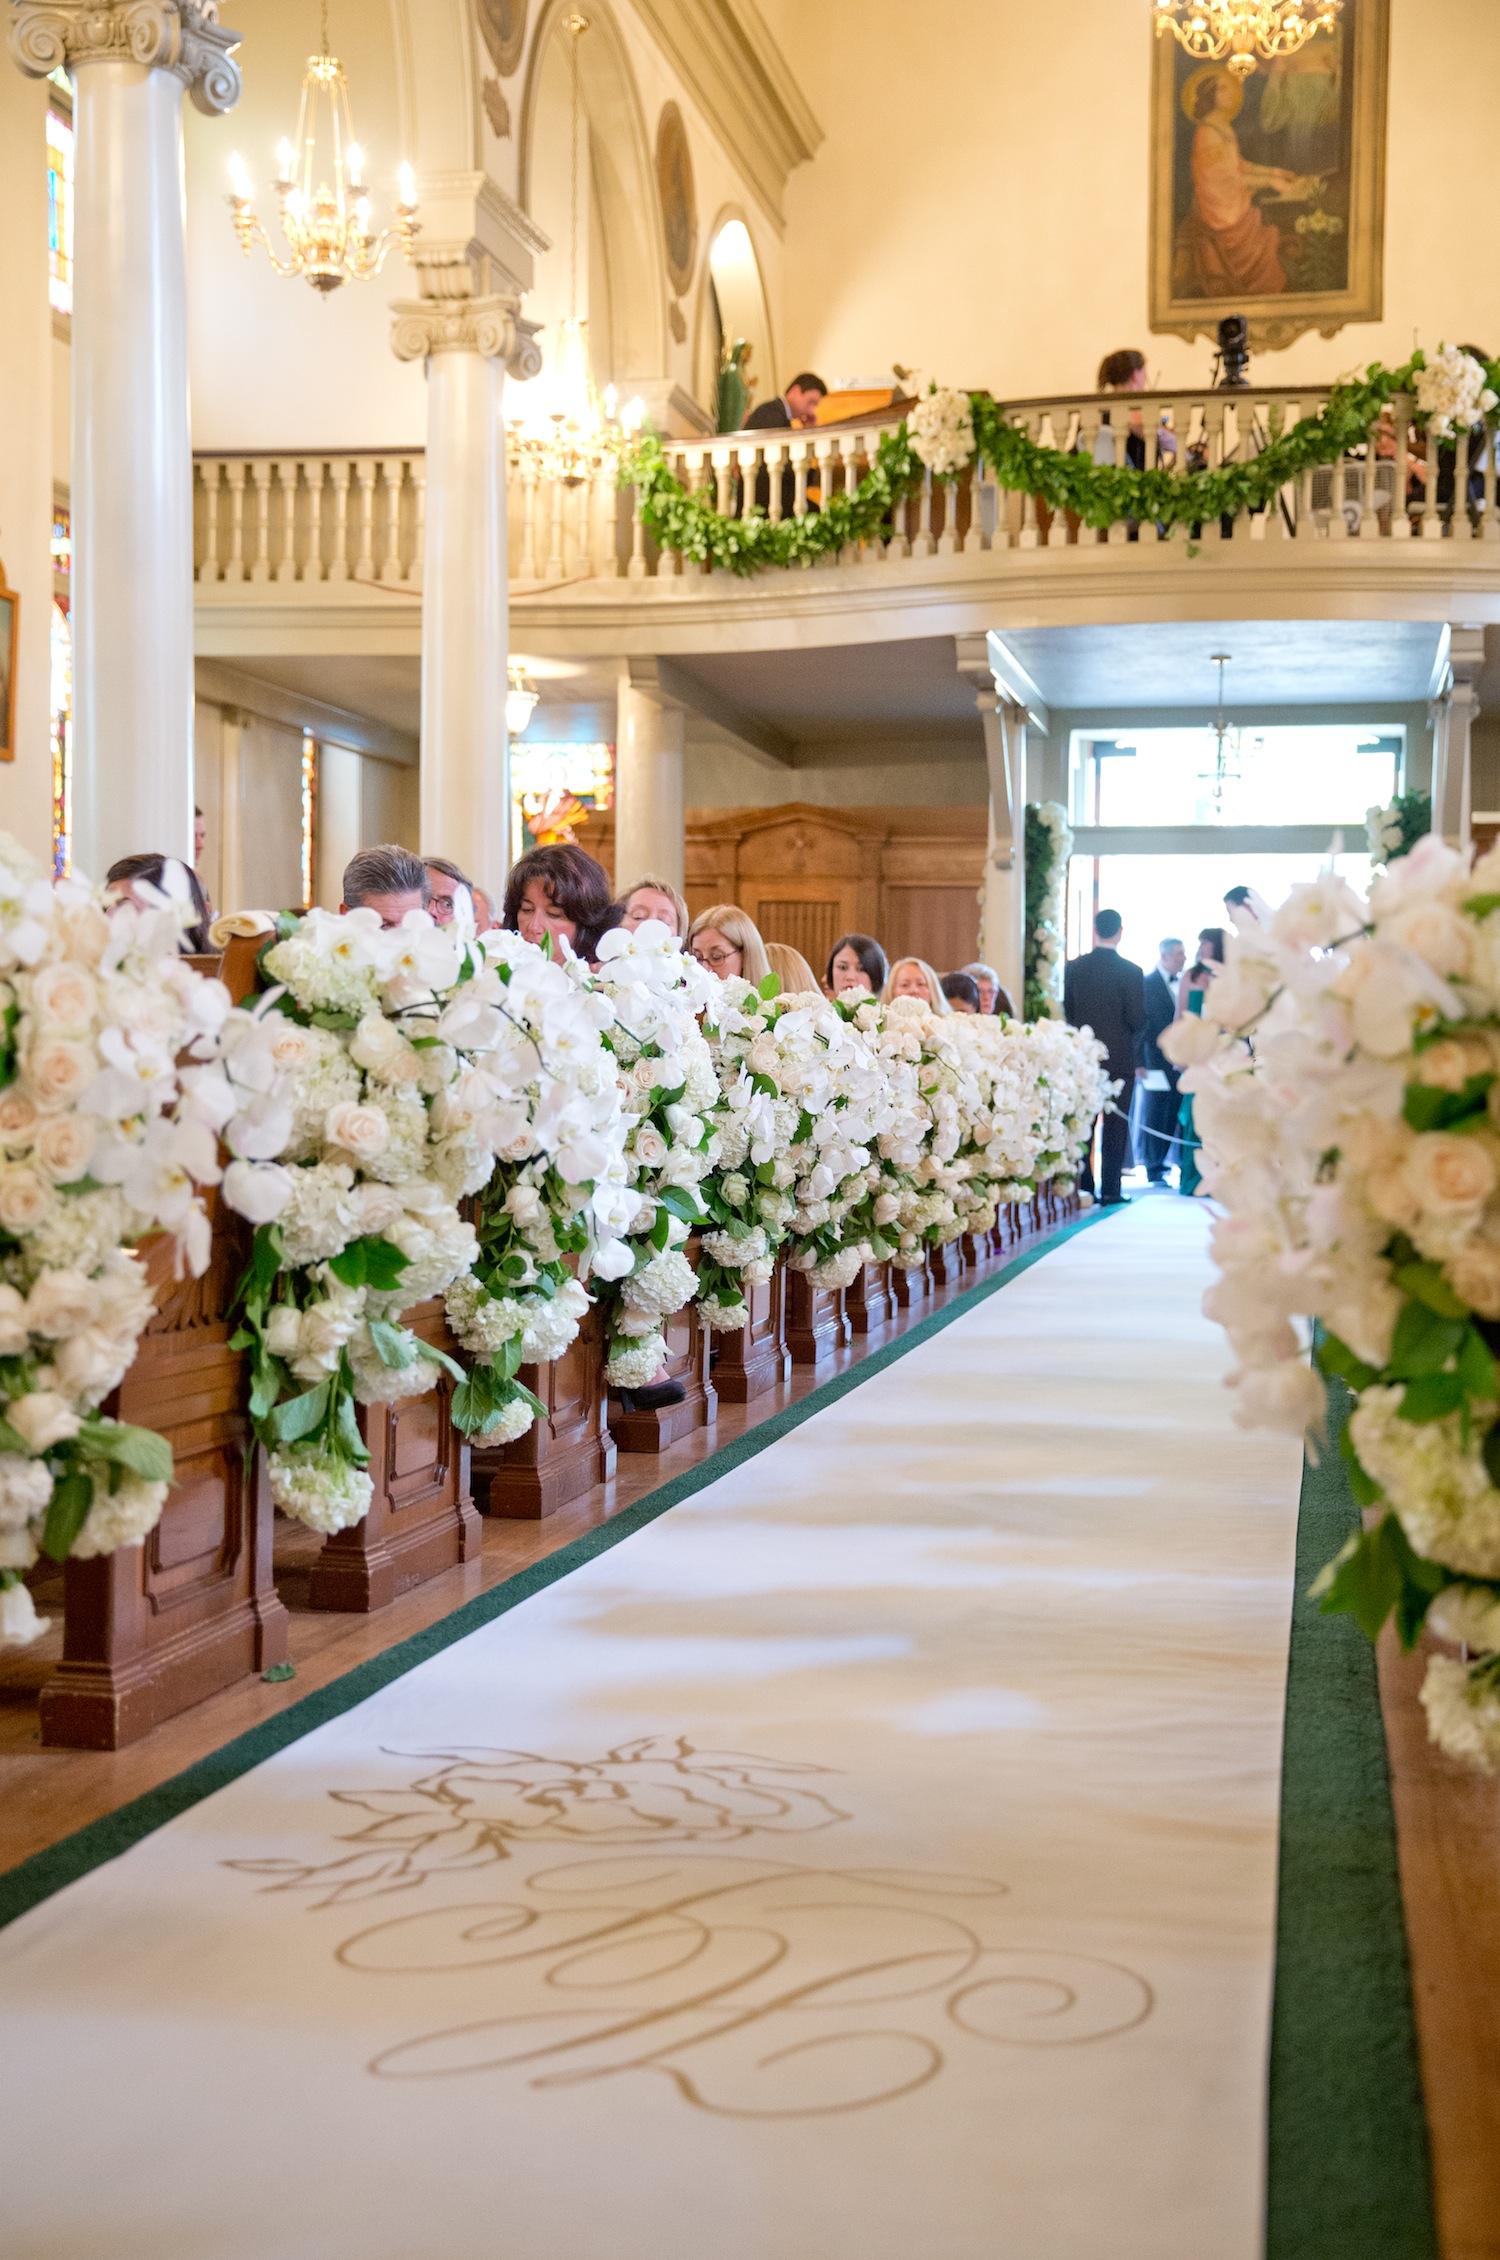 wedding aisle decorations Custom aisle runner and flowers at church wedding